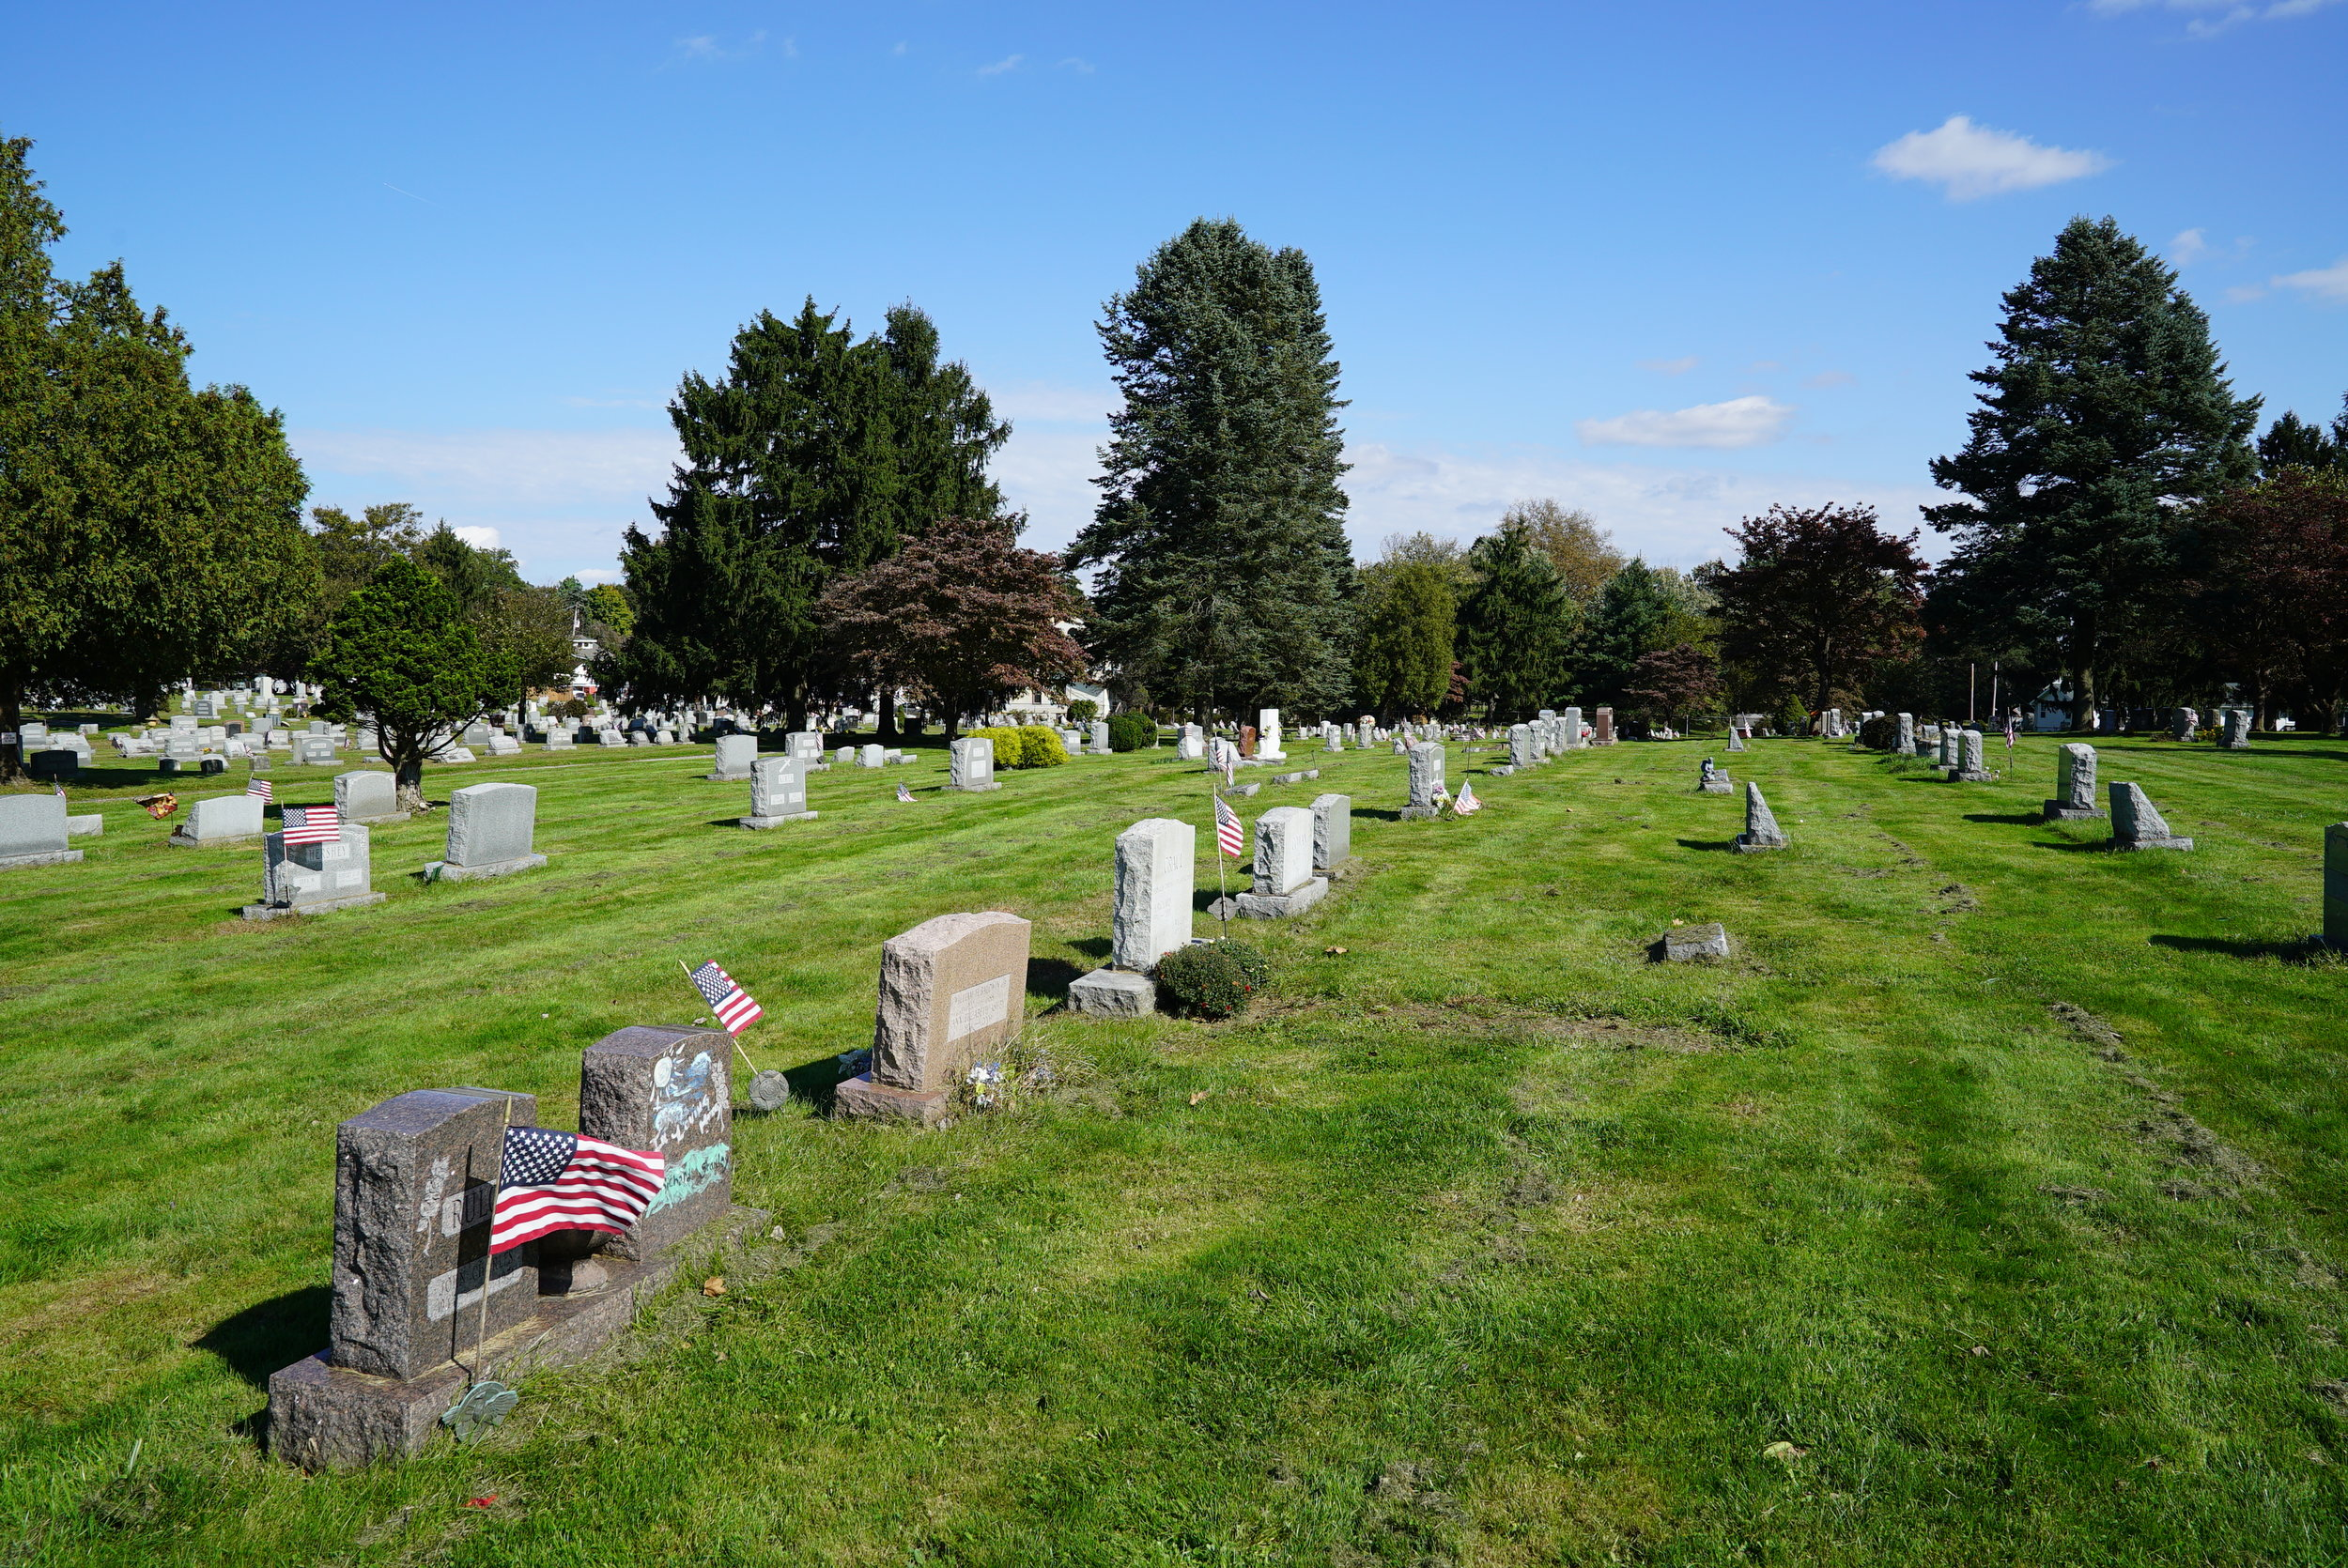 Green Mount Cemetery - West Chester, Pennsylvania. October 22, 2018.